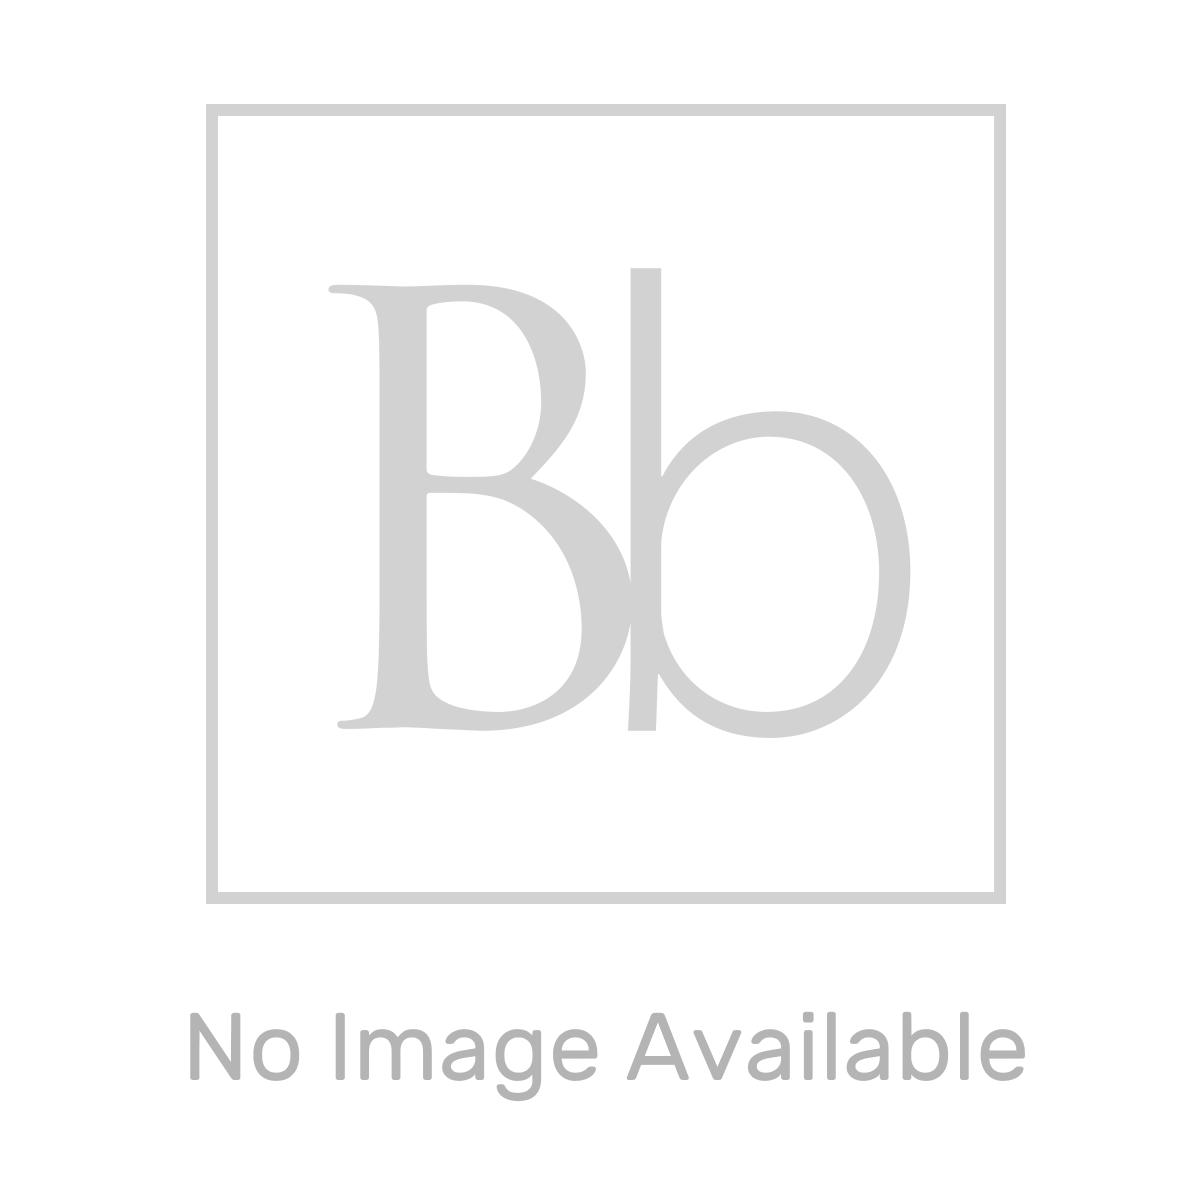 RAK Demeter Plus Round Magnifying Mirror With Light